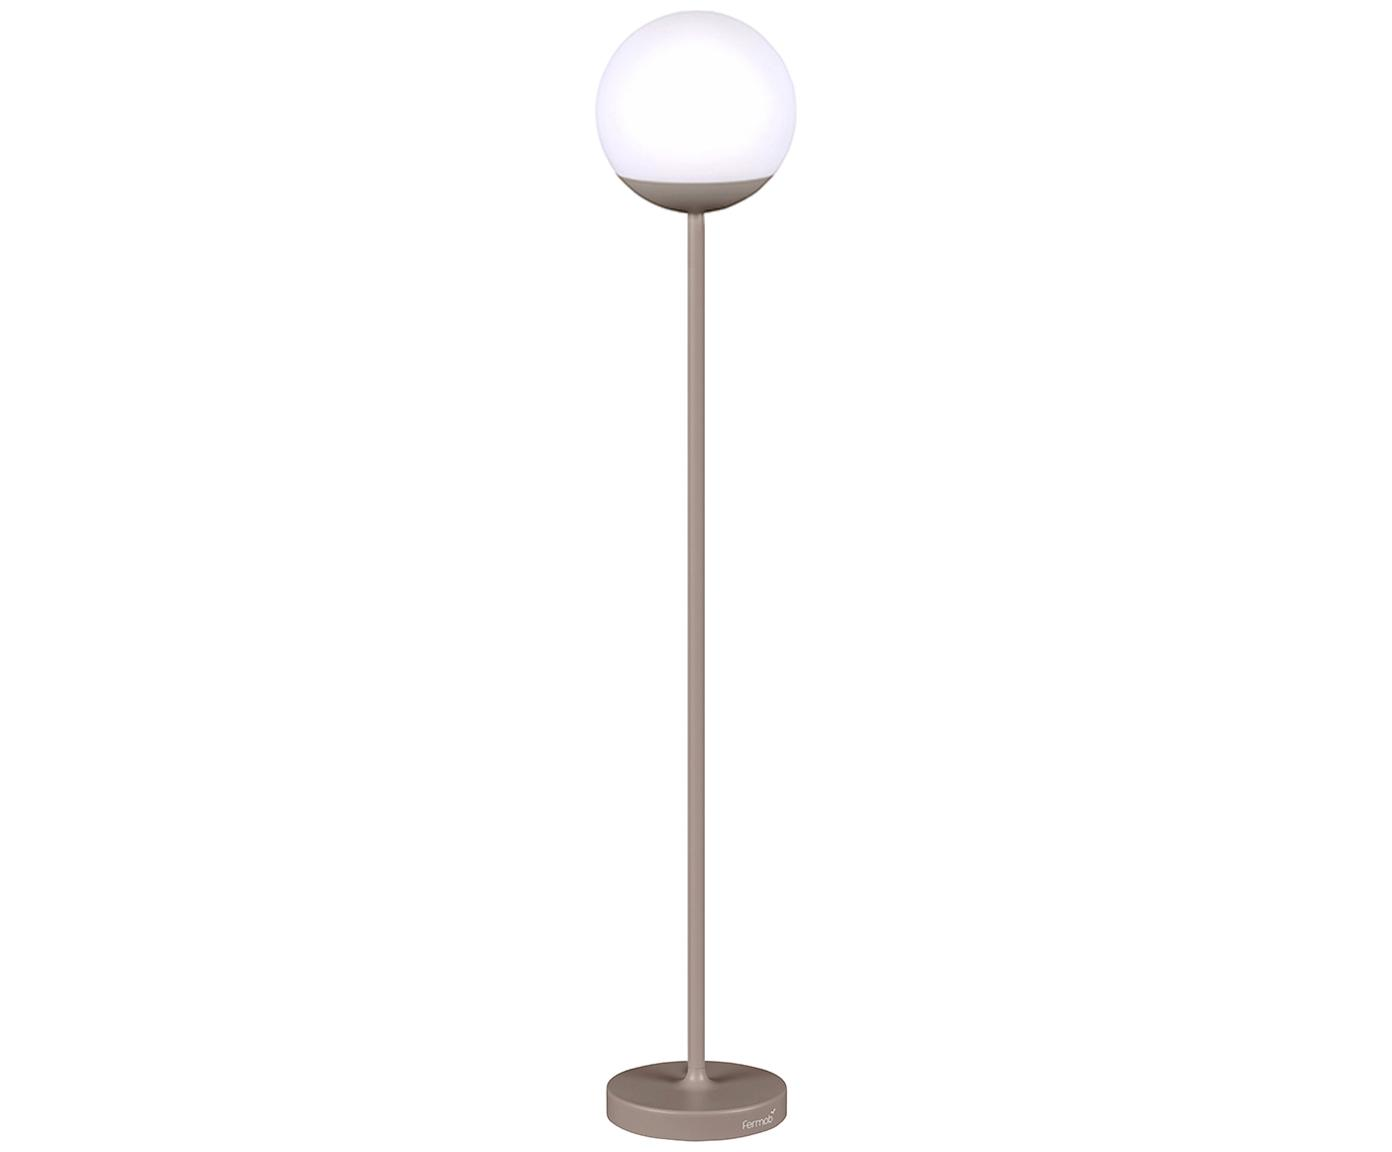 Lampada portatile da esterno a LED Mooon, Paralume: materiale sintetico, Marrone moscato, Ø 25 x Alt. 134 cm